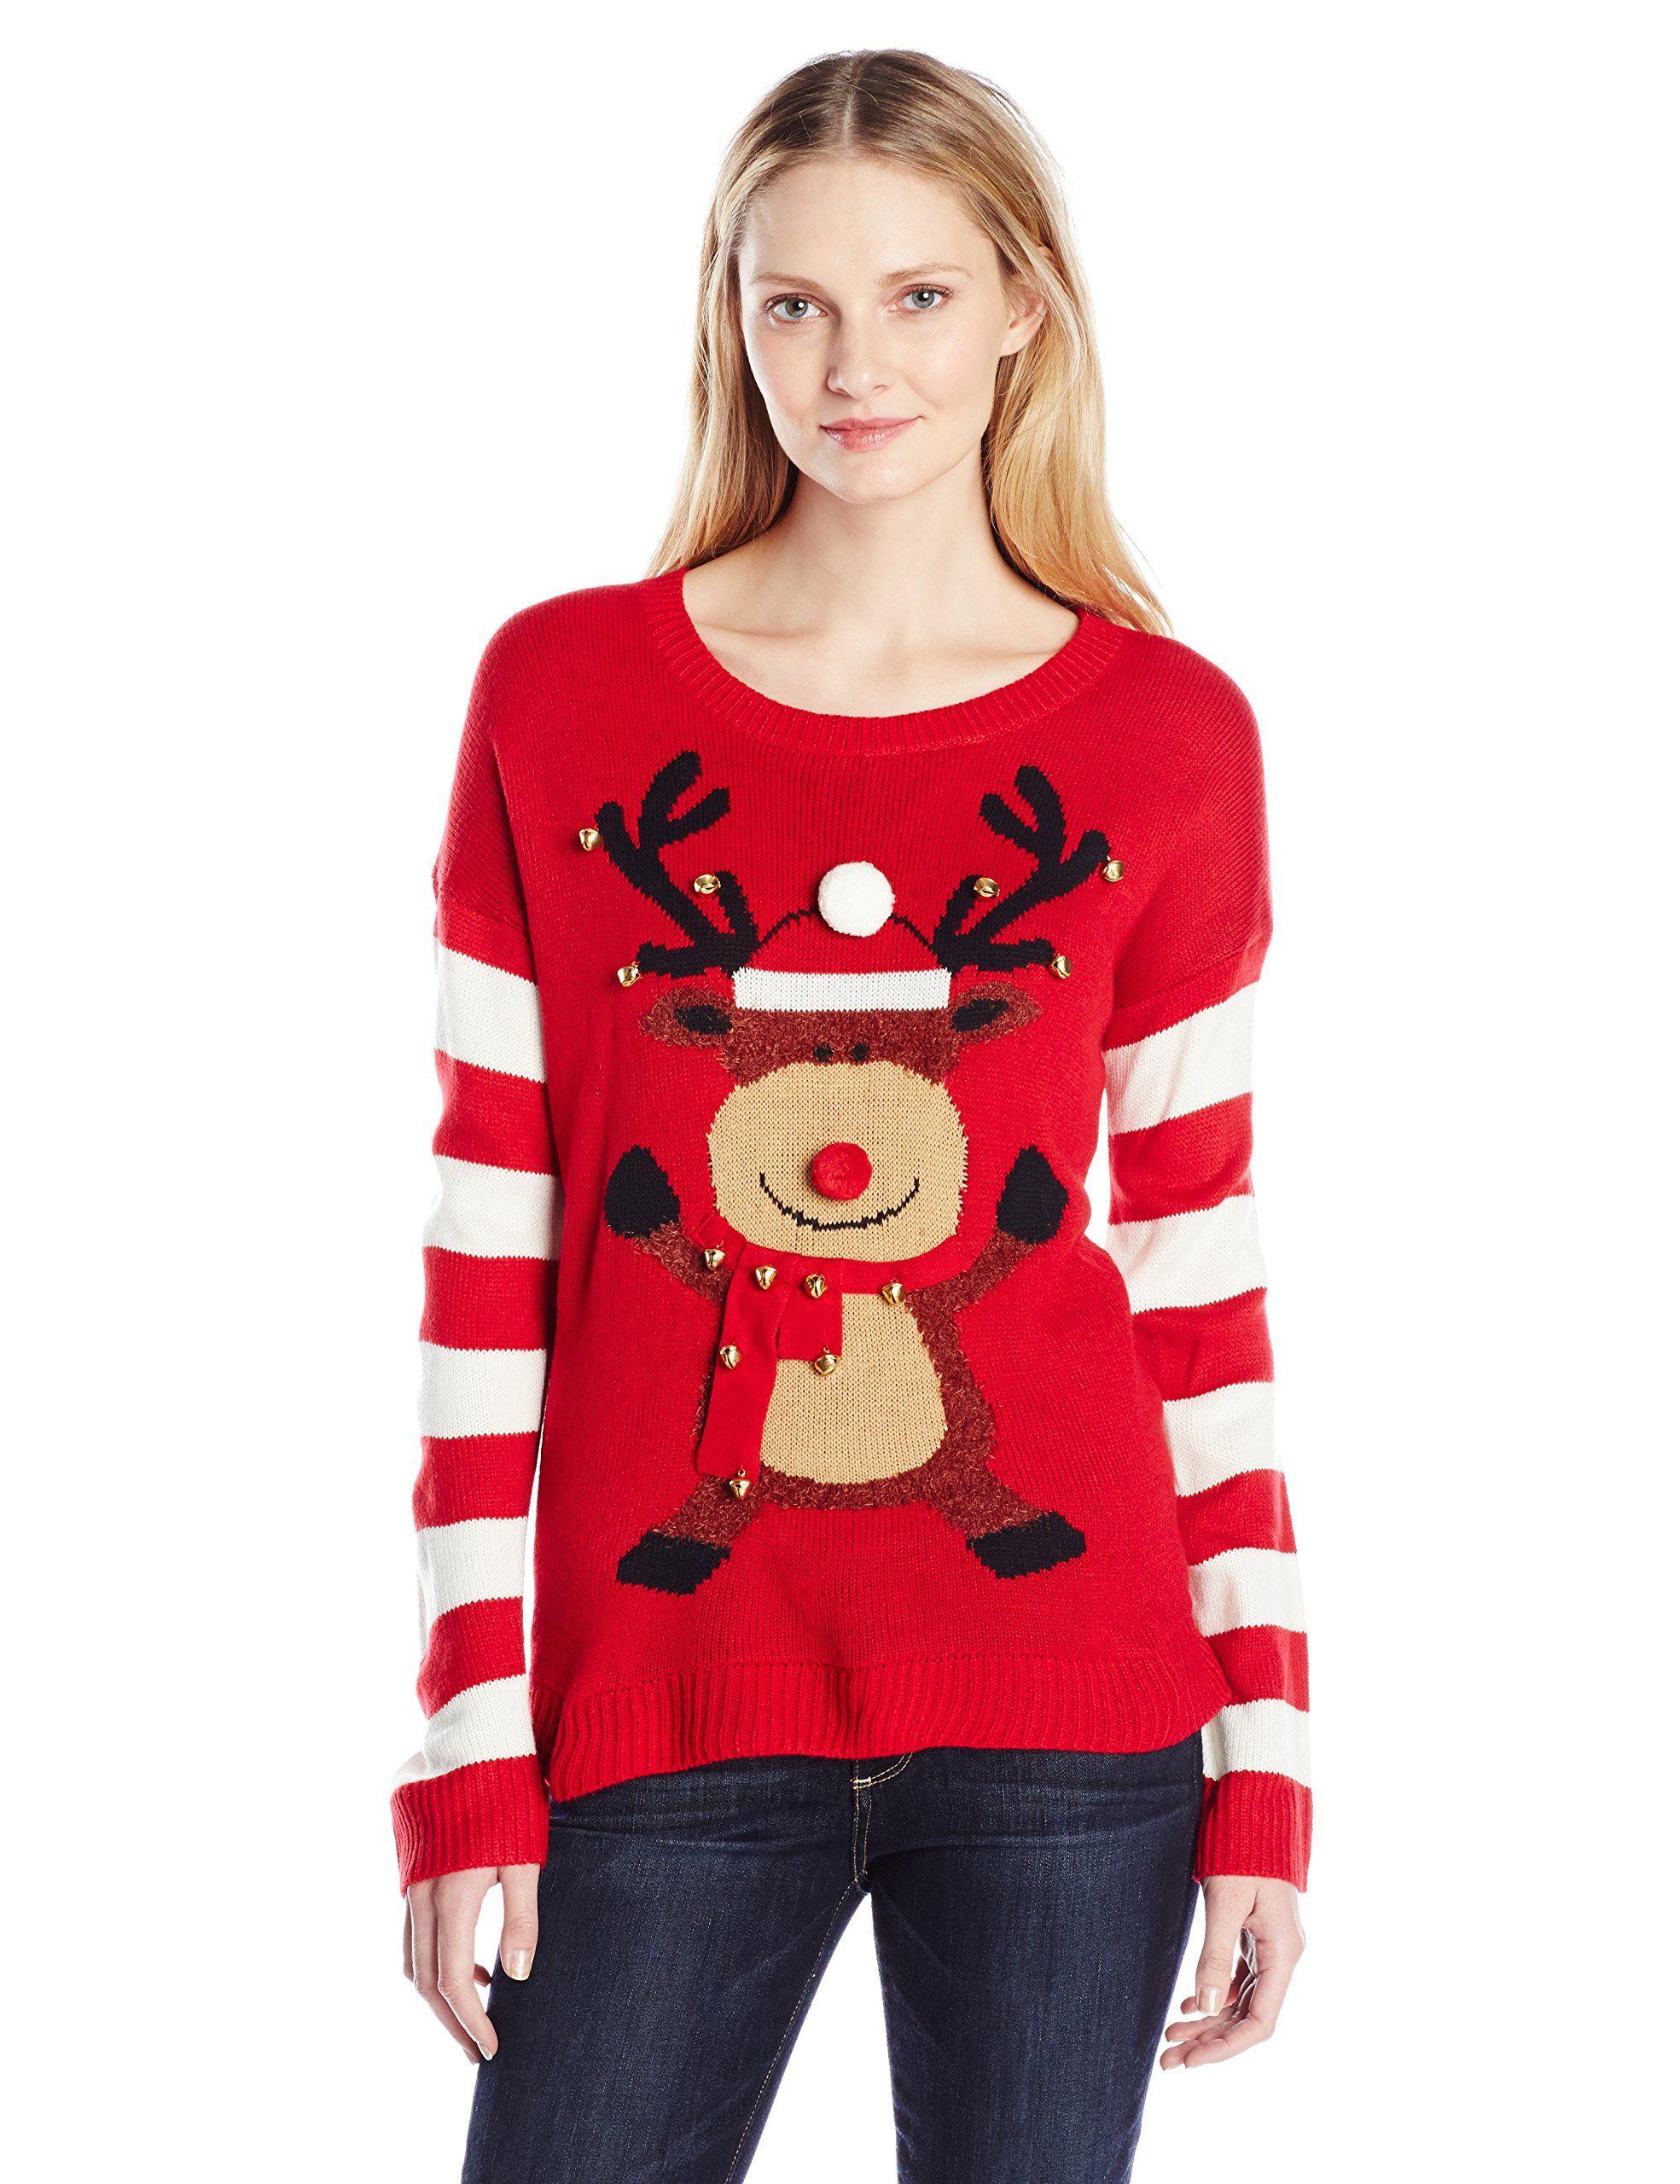 Amazoncom Blizzard Bay Womens Happy Rudolph Ugly Christmas